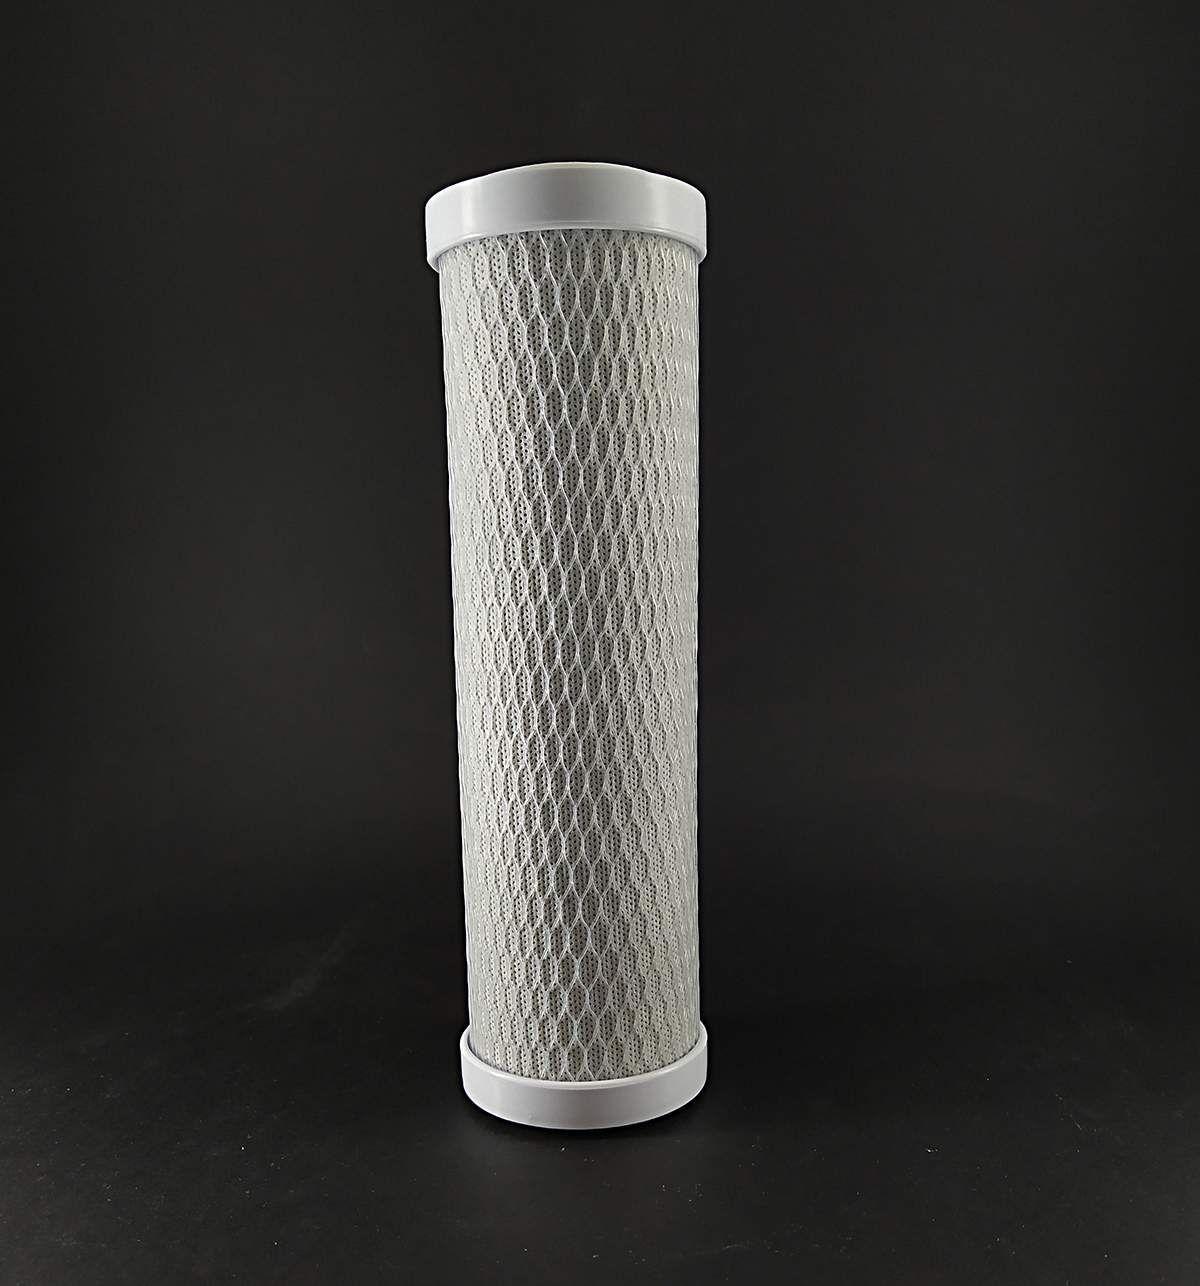 Carvão Block 236mm Elemento Filtrante (Aqualimp)